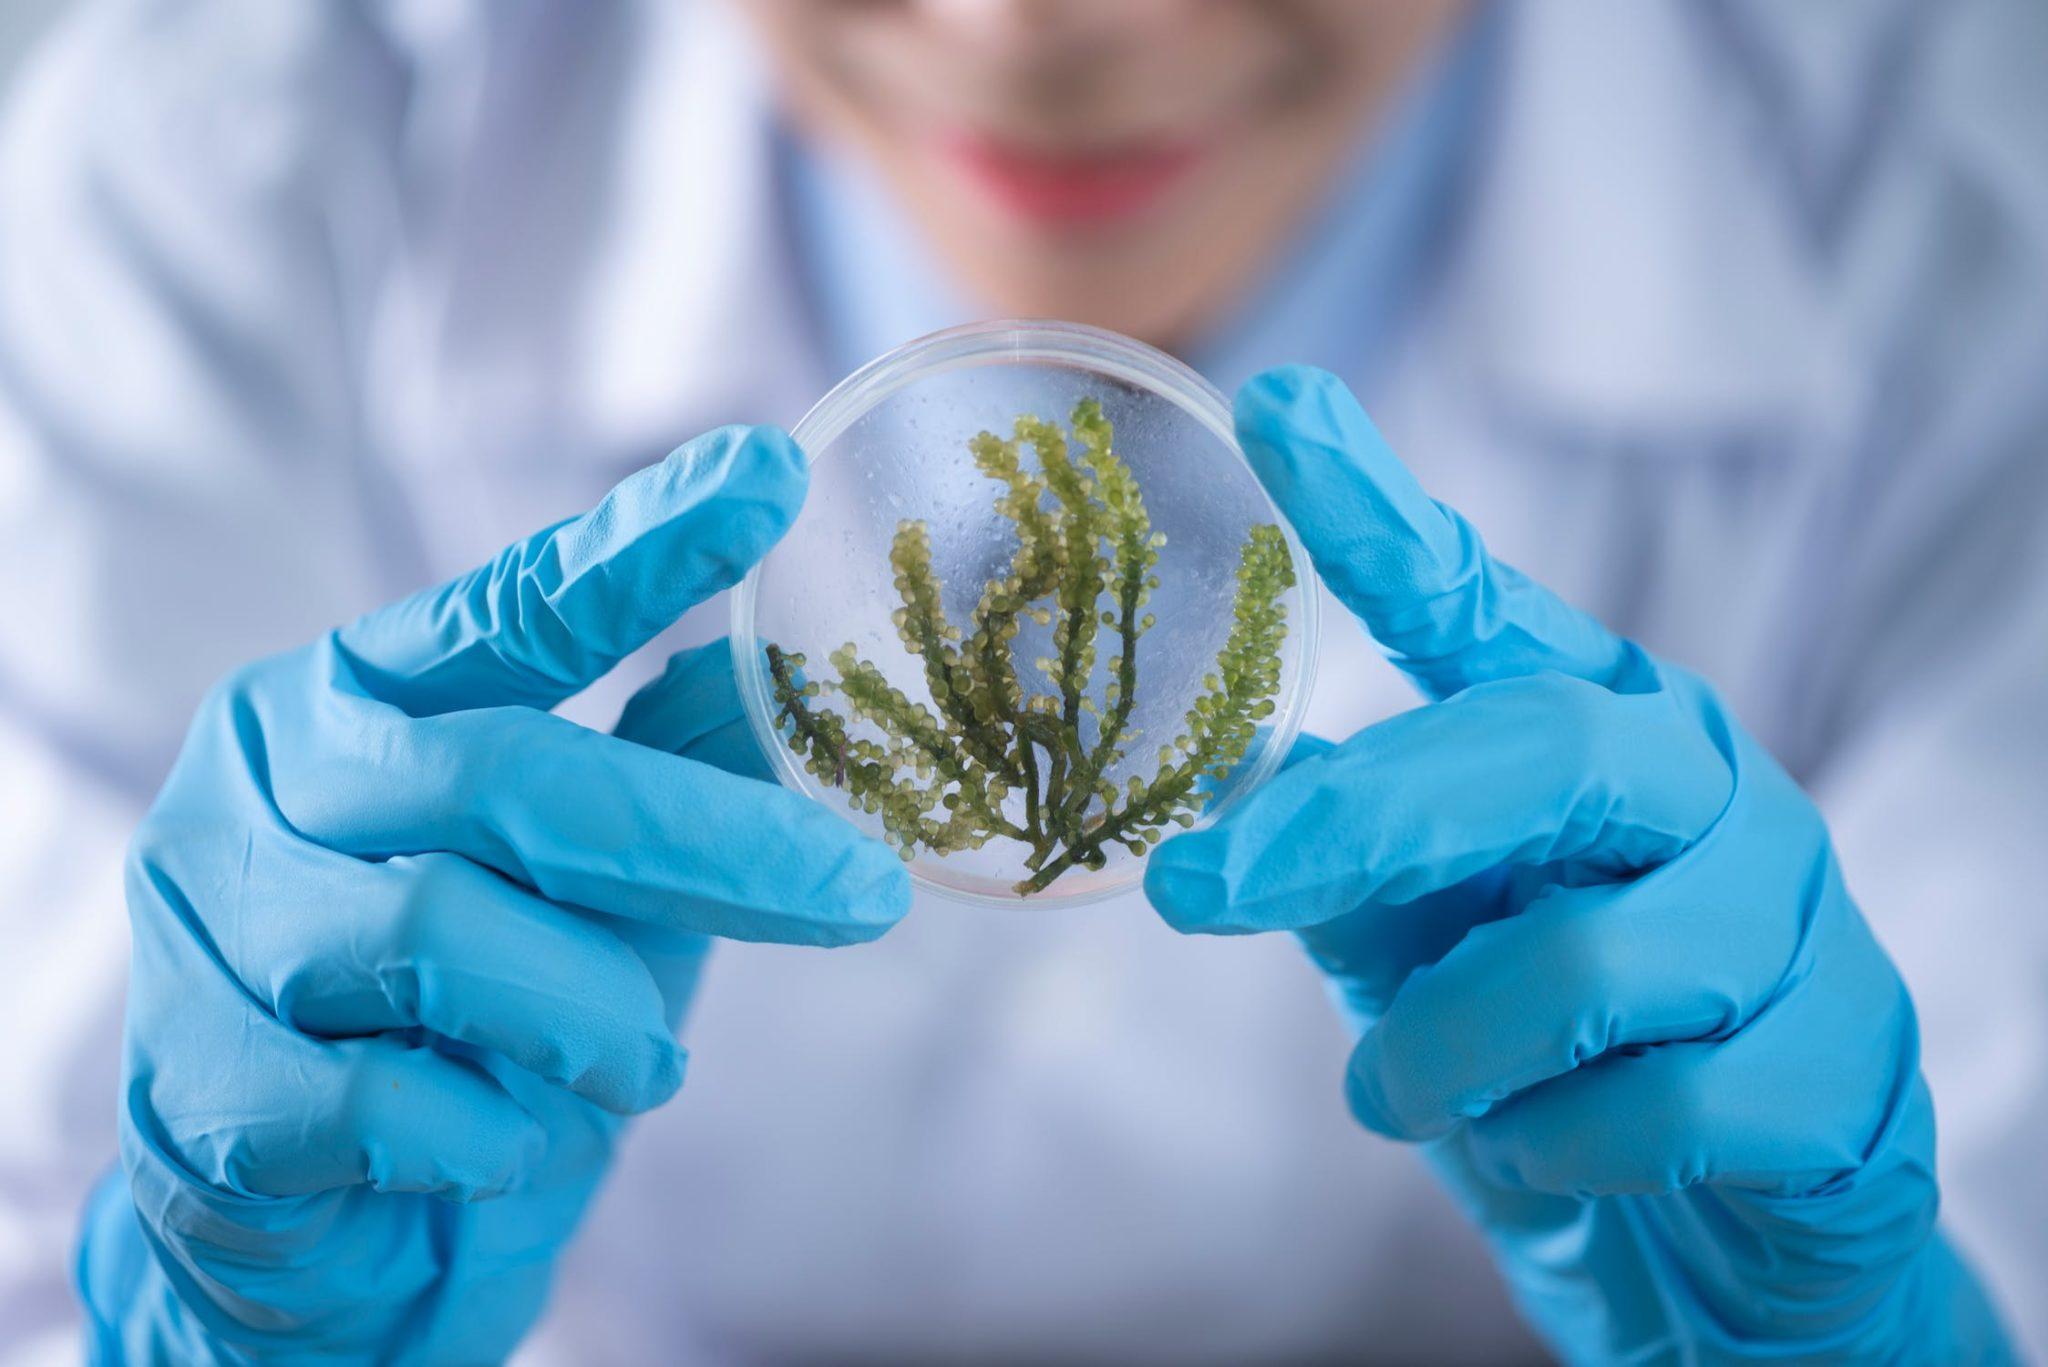 bioscience in a petri dish